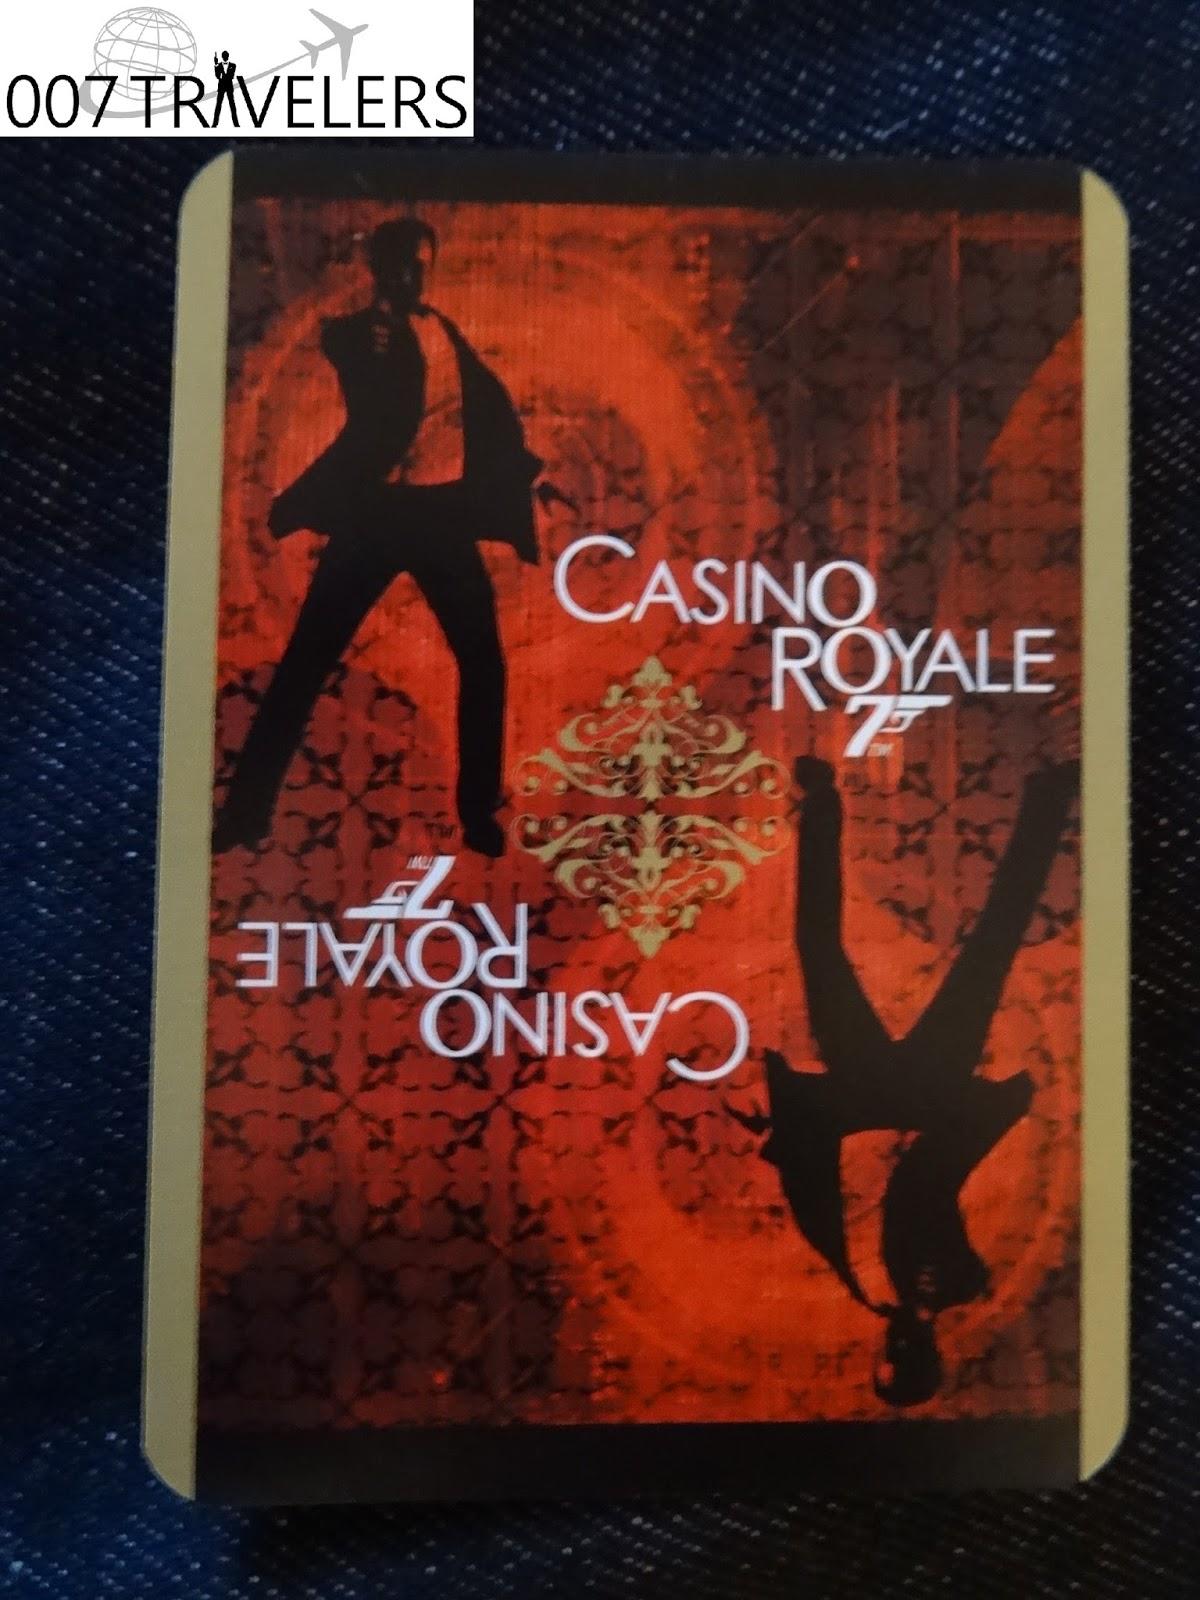 007 video de 007 casino royale